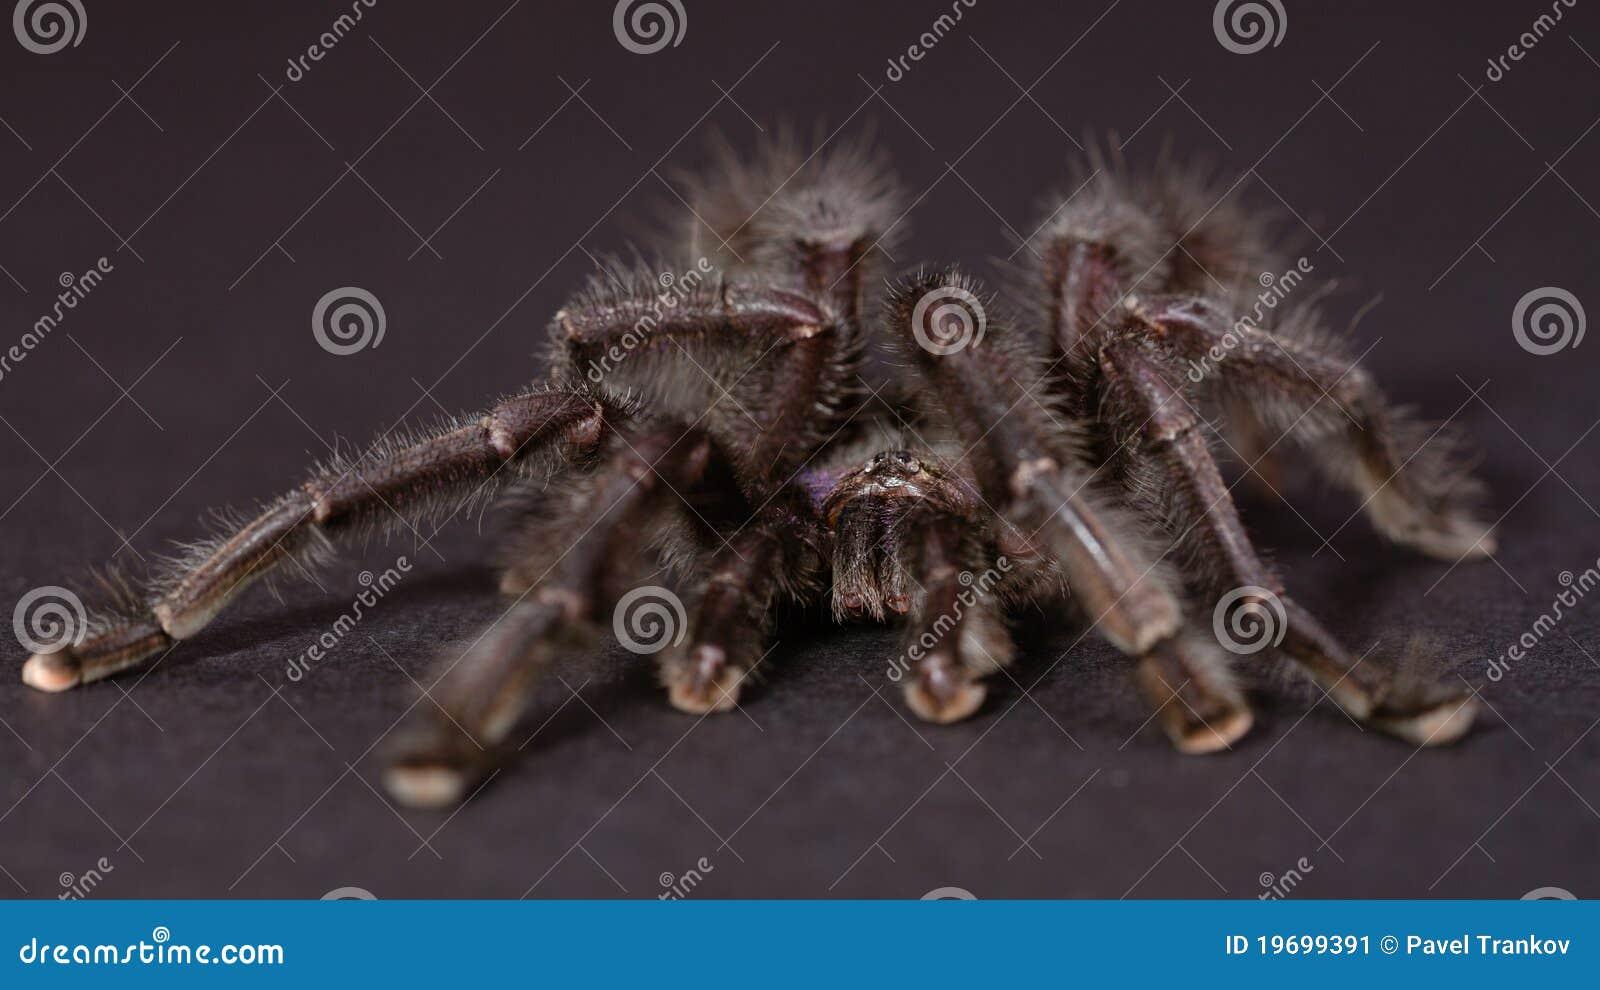 The Purple Pinktoe Tarantula